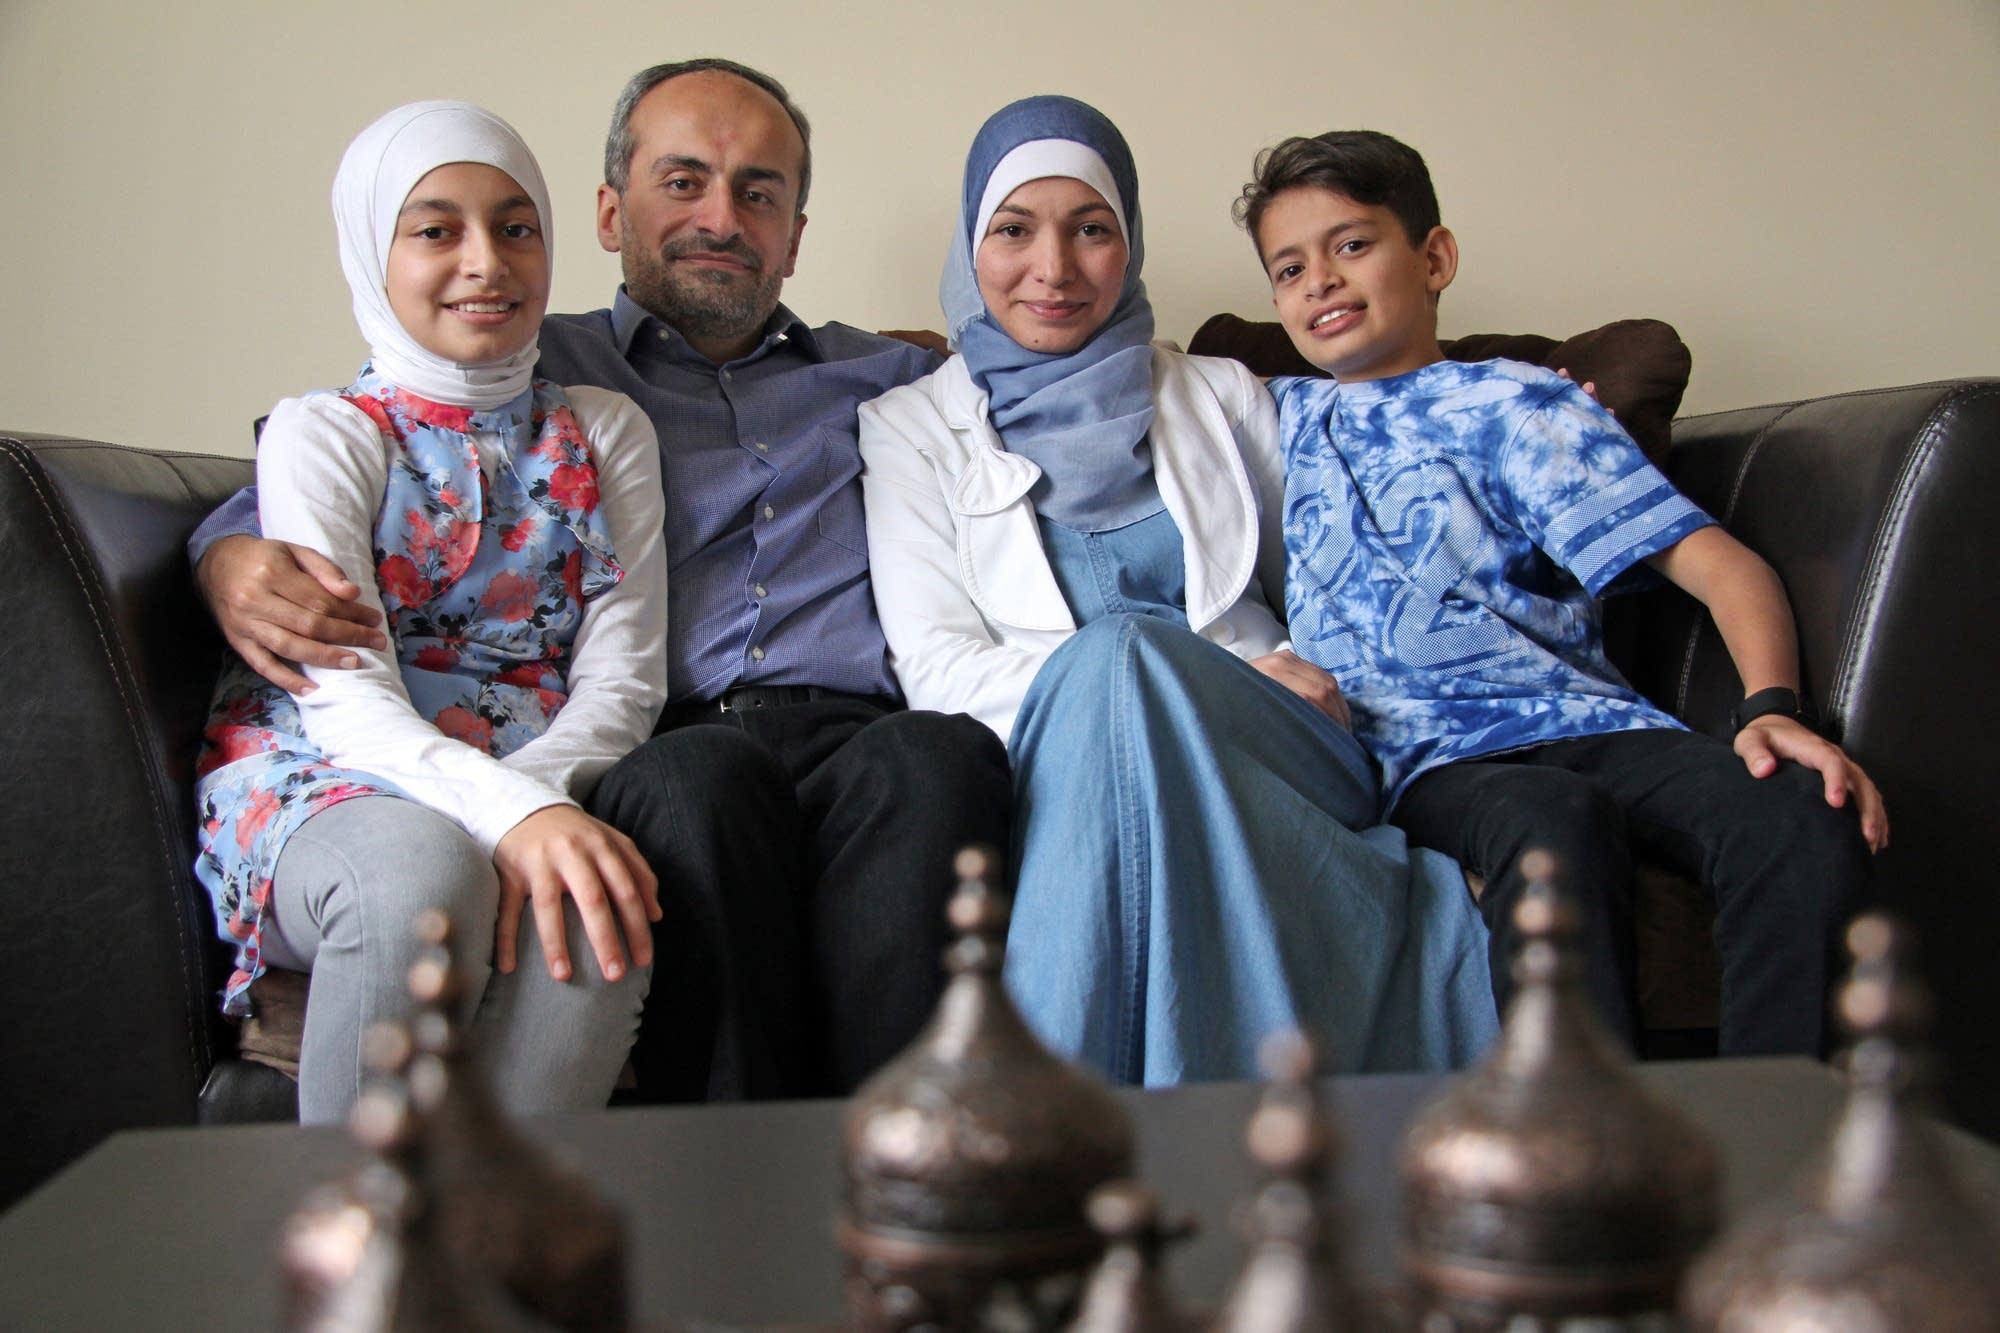 Aya, 13, Shadi Anis, Ranim Alchaar, and Abdullah, 11, feel welcome.